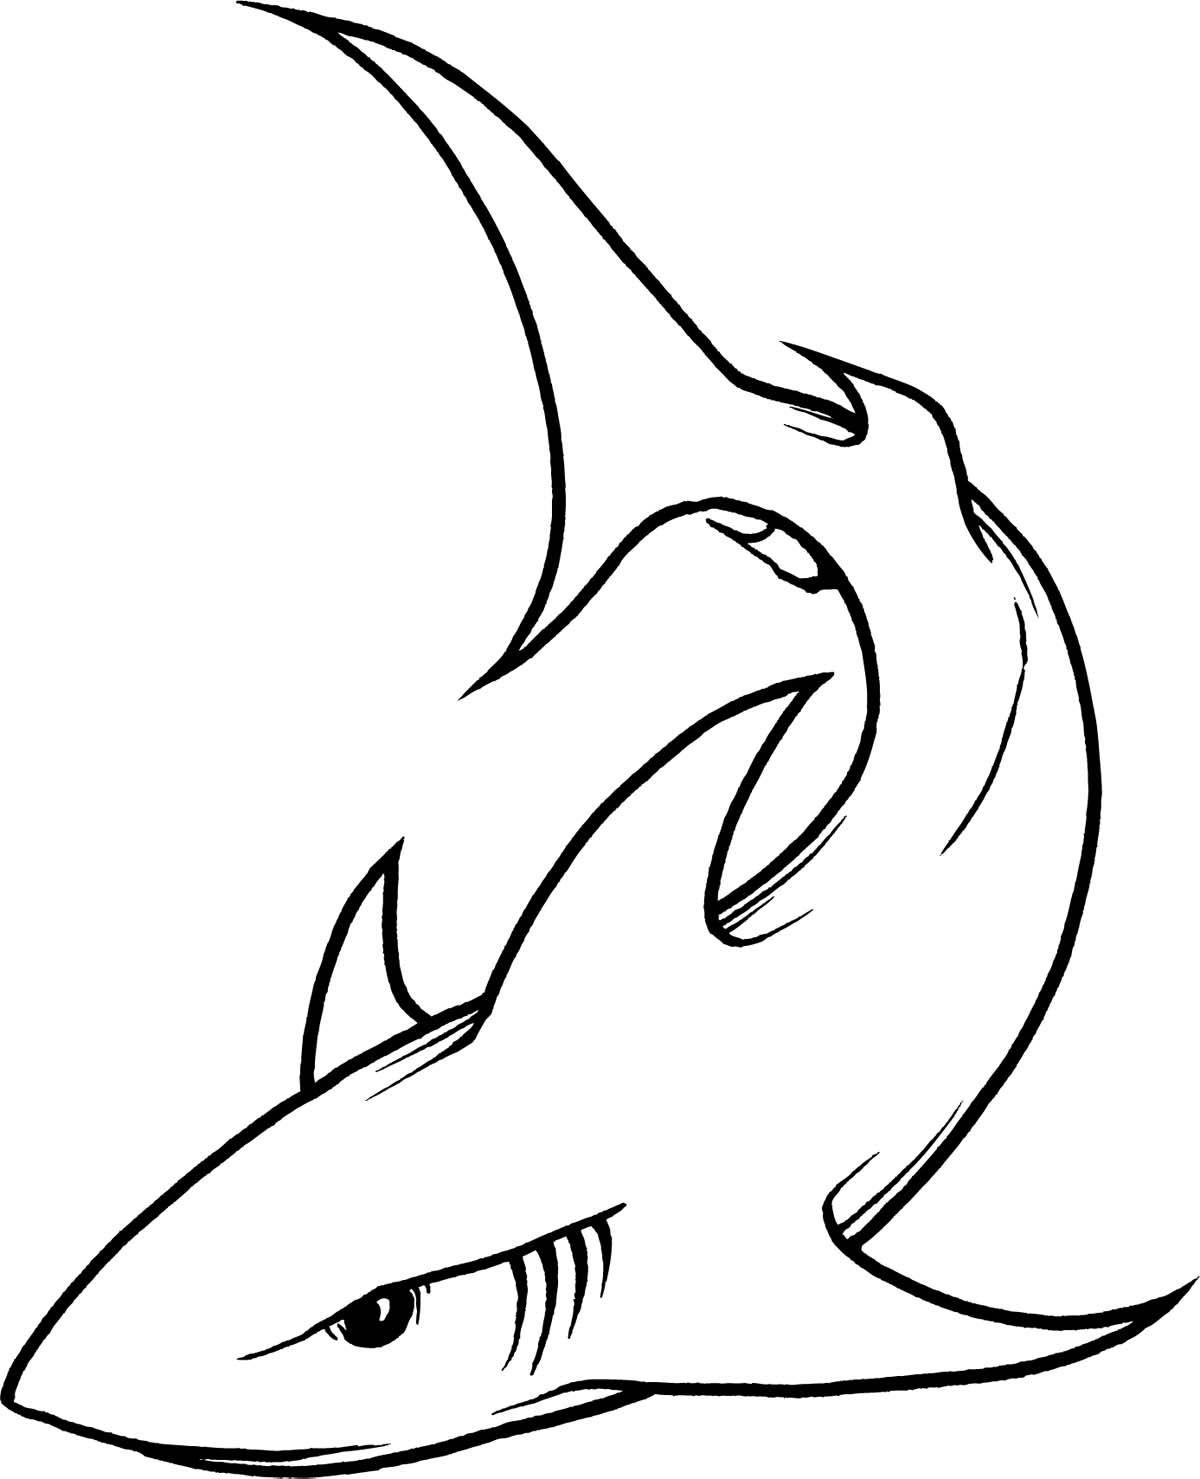 6126 Shark free clipart.